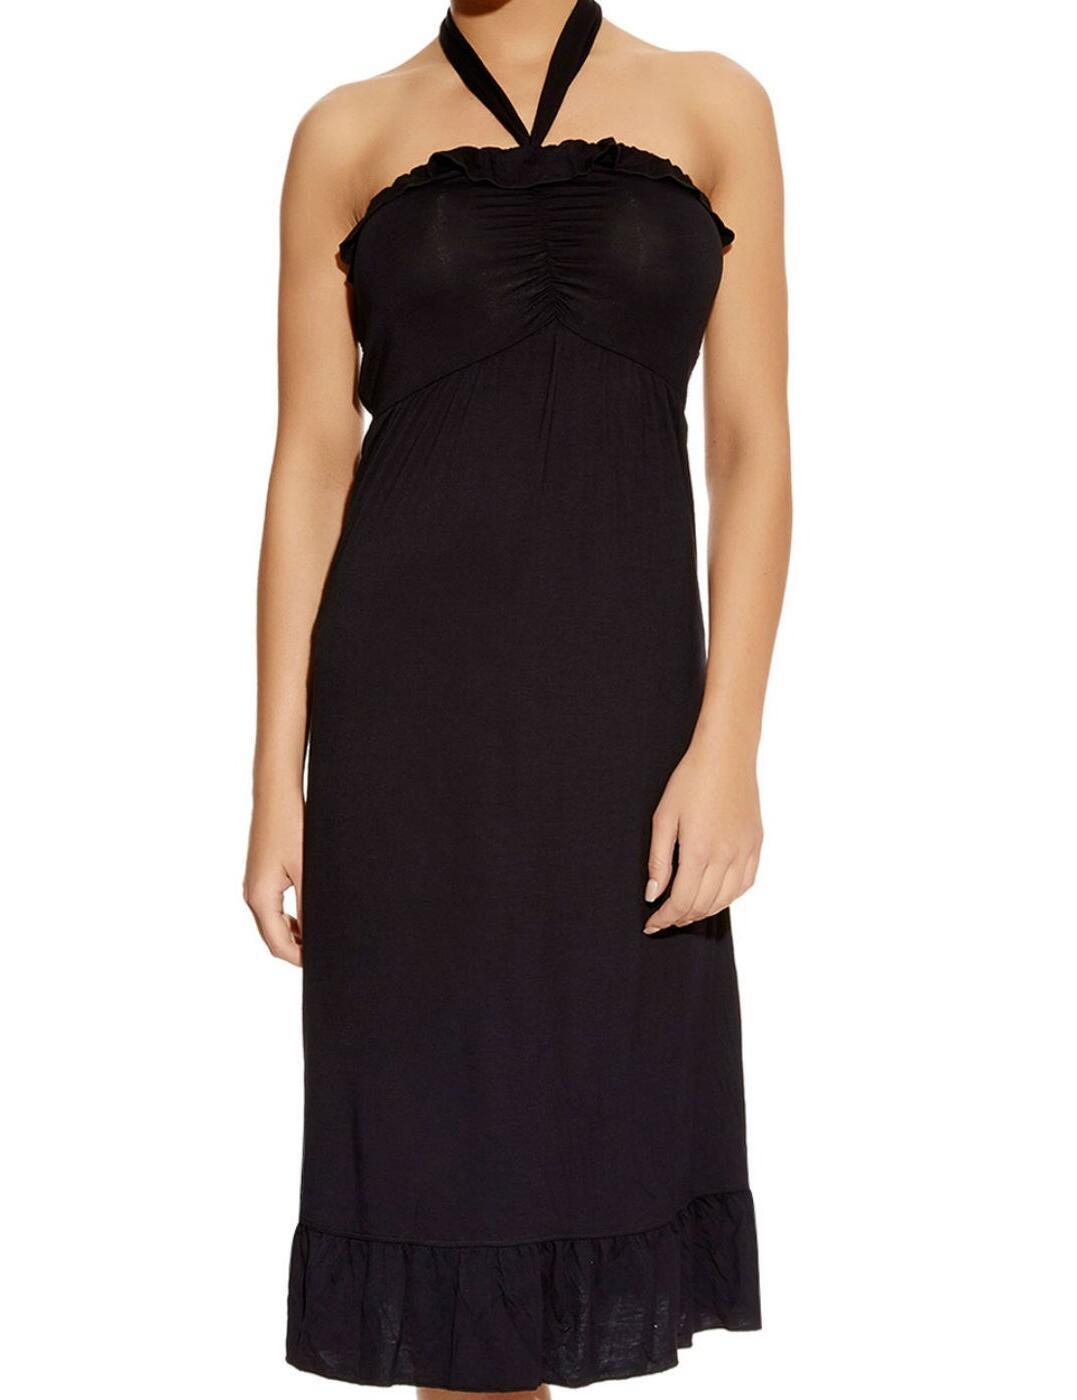 3479 Freya Paradise Jersey Beach Dress - 3479 Black